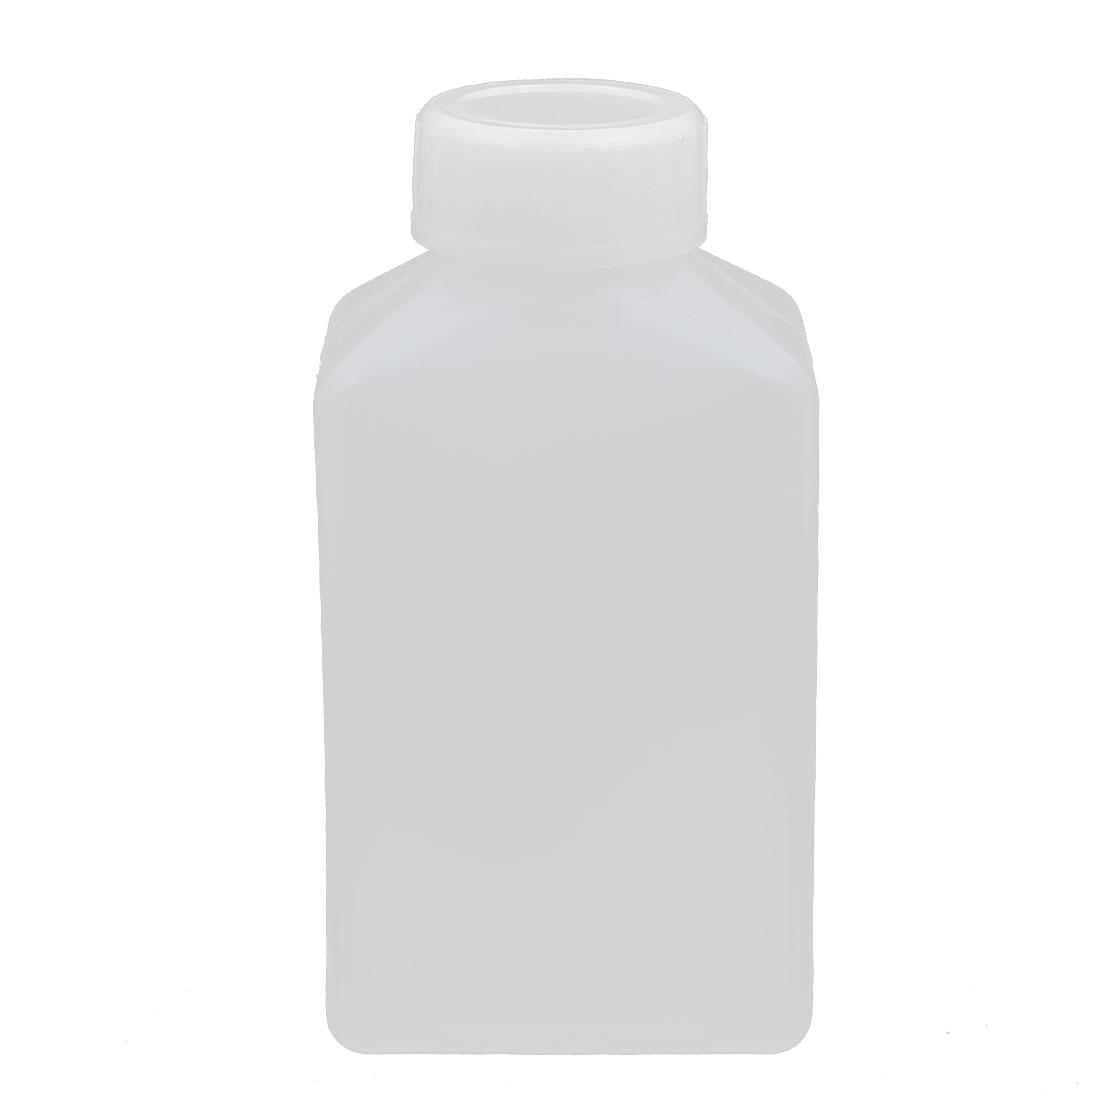 100ml HDPE Plastic Bottle Translucent DIY Square Bottle w Cover